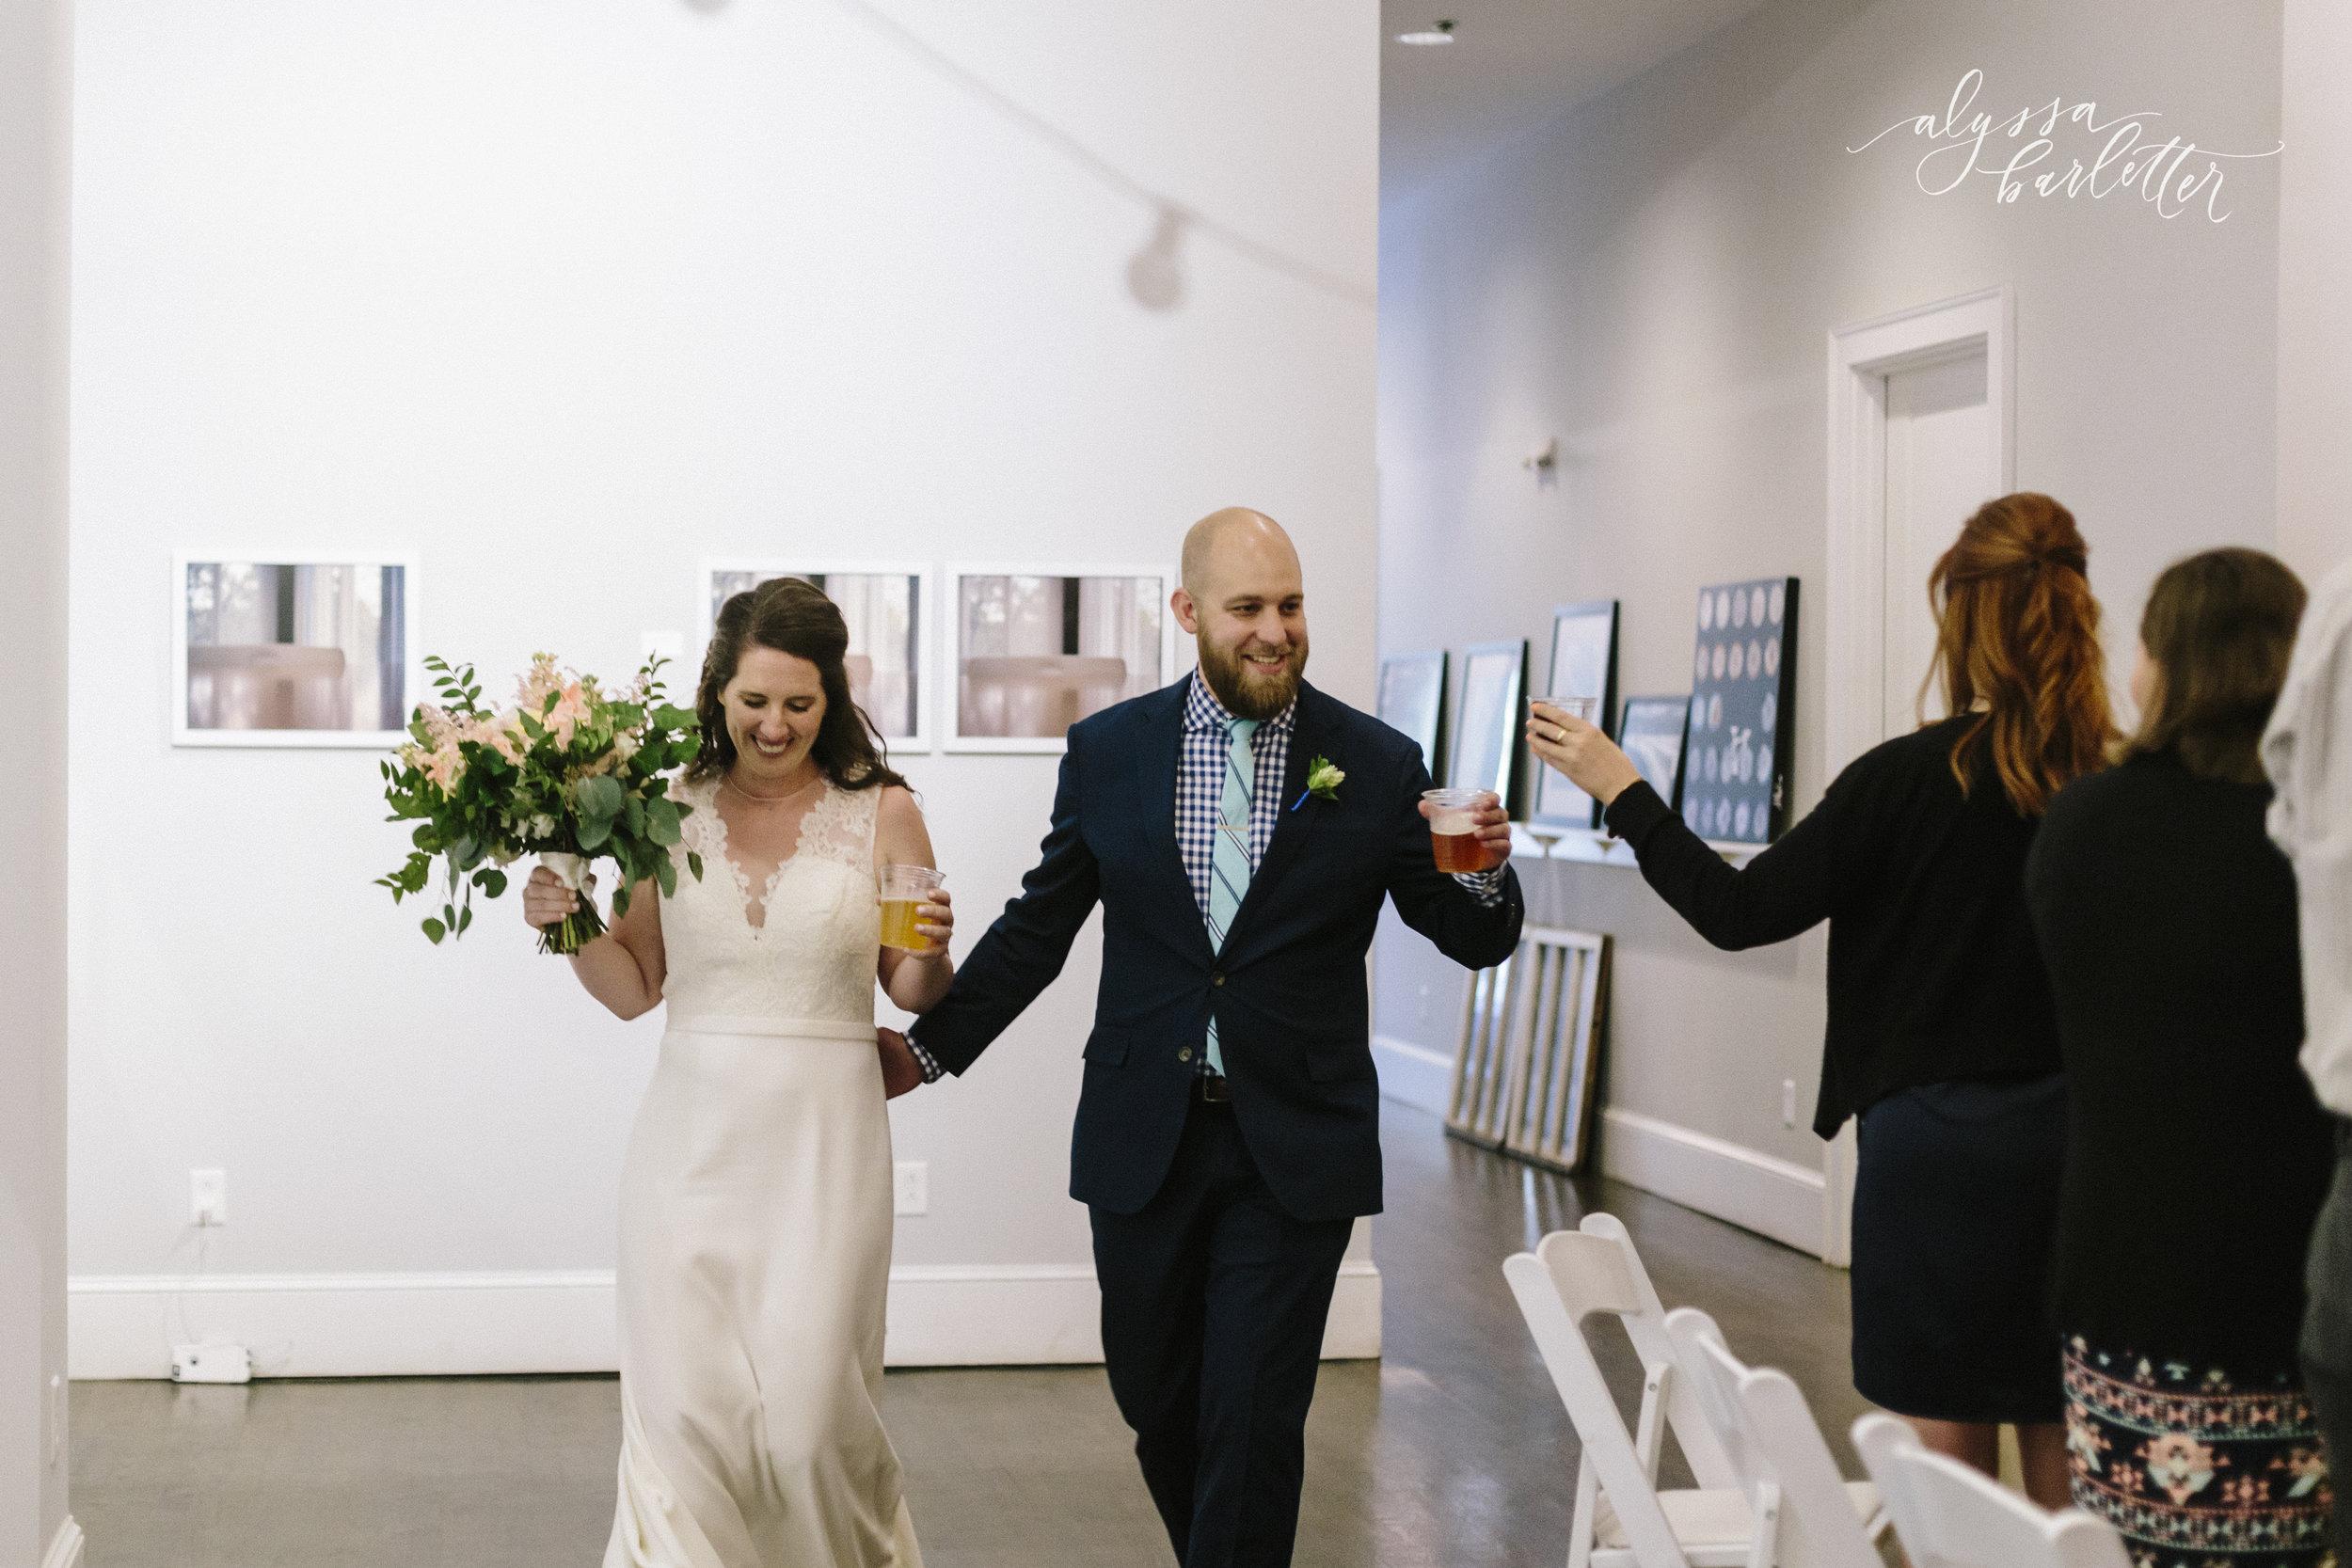 alyssa barletter photography kansas city wedding 2016 main courtney and brian-1-45.jpg